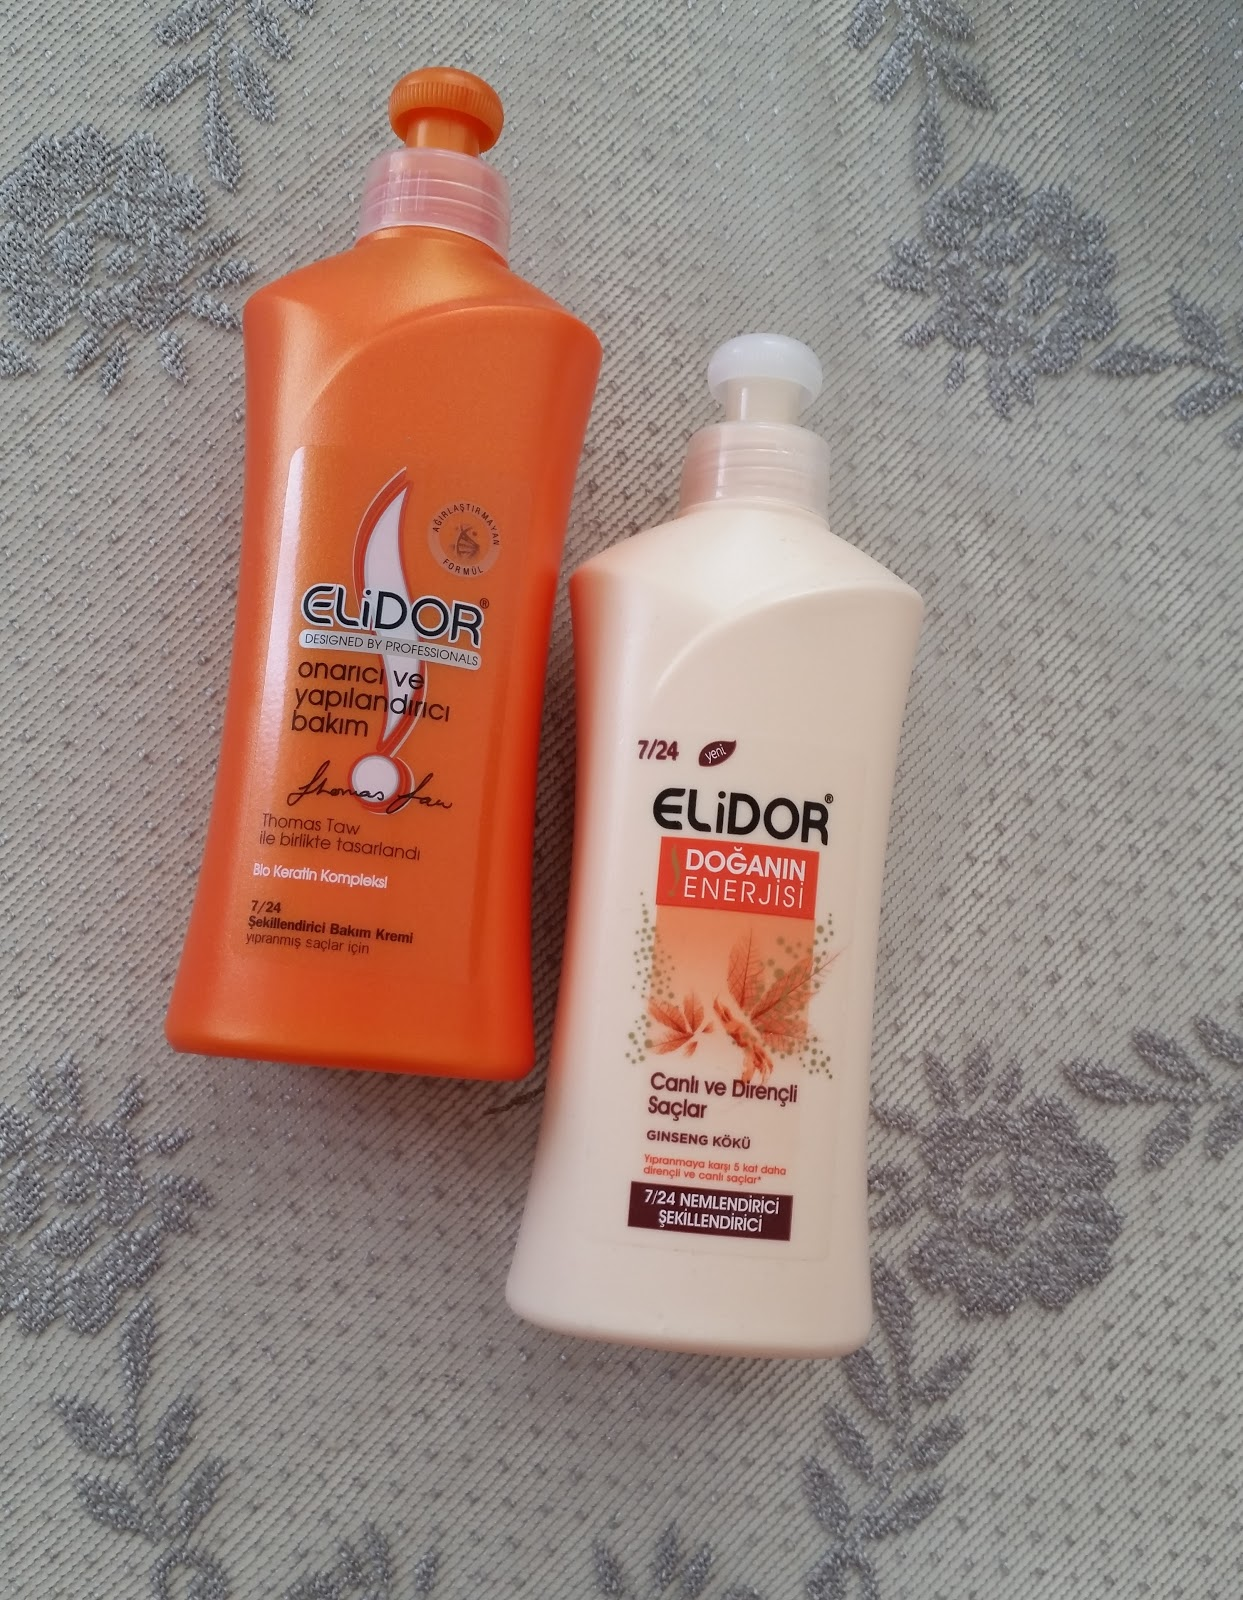 elidor shampoo kaufen